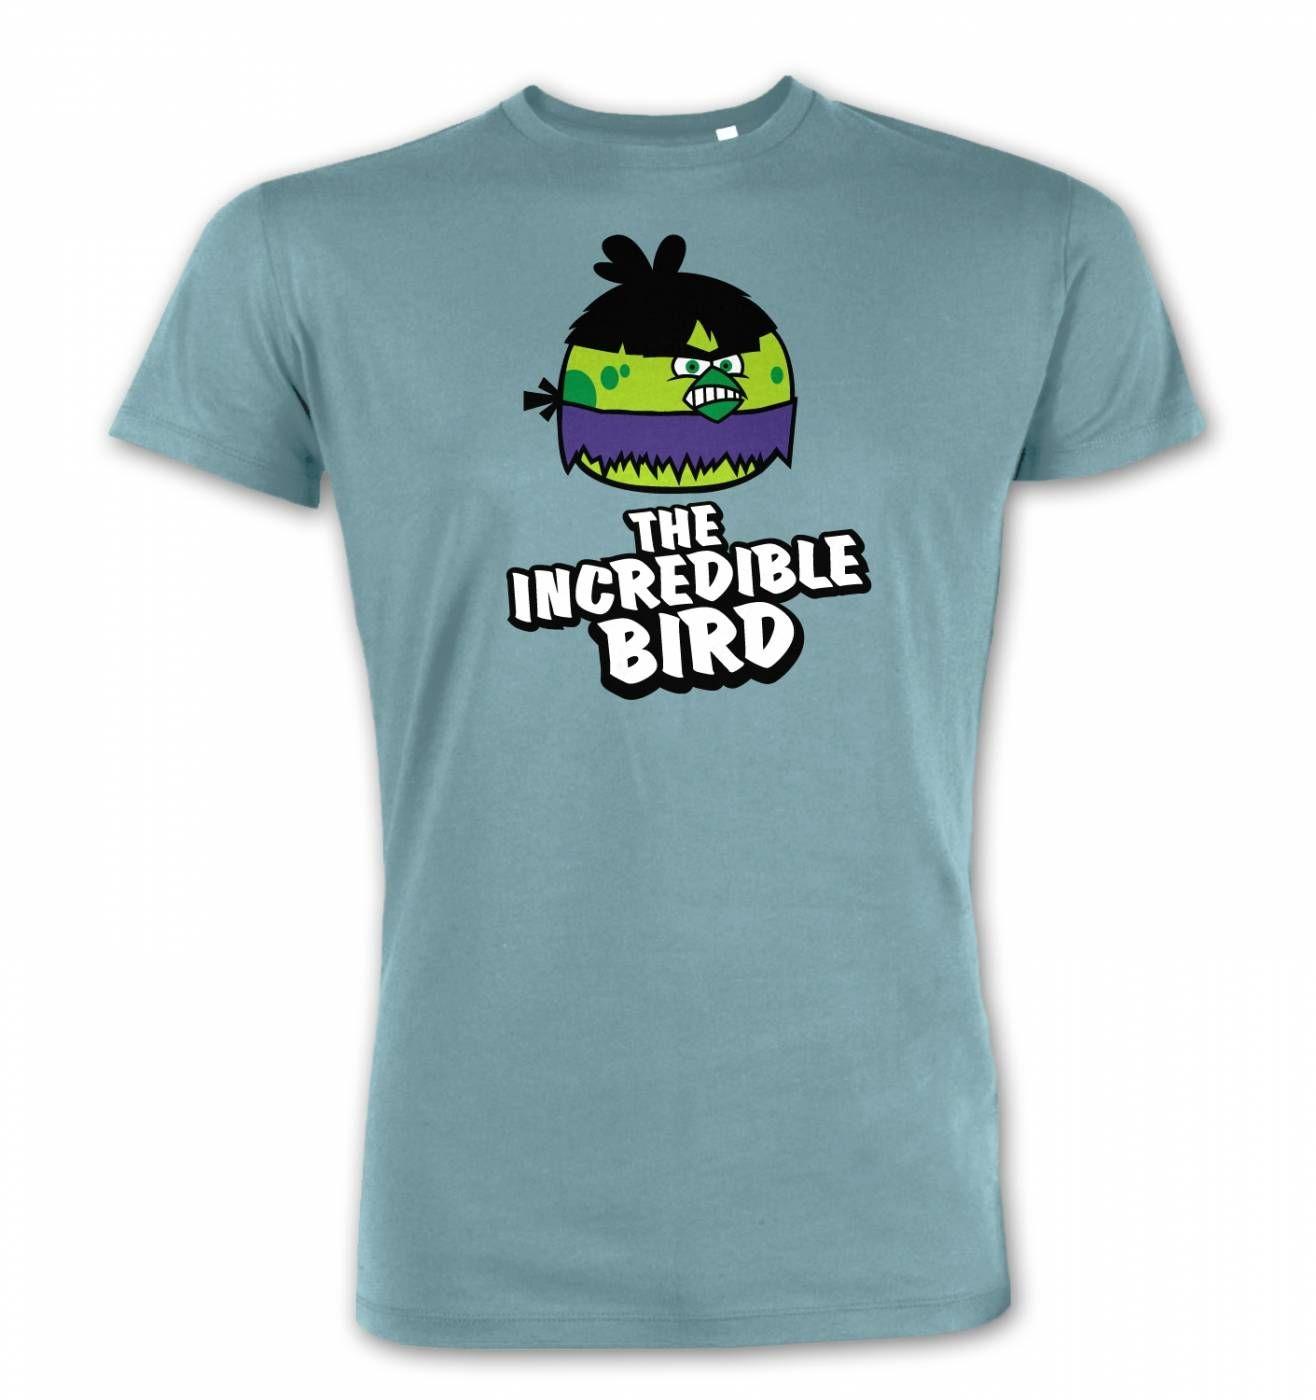 The Incredible Bird men's Premium t-shirt